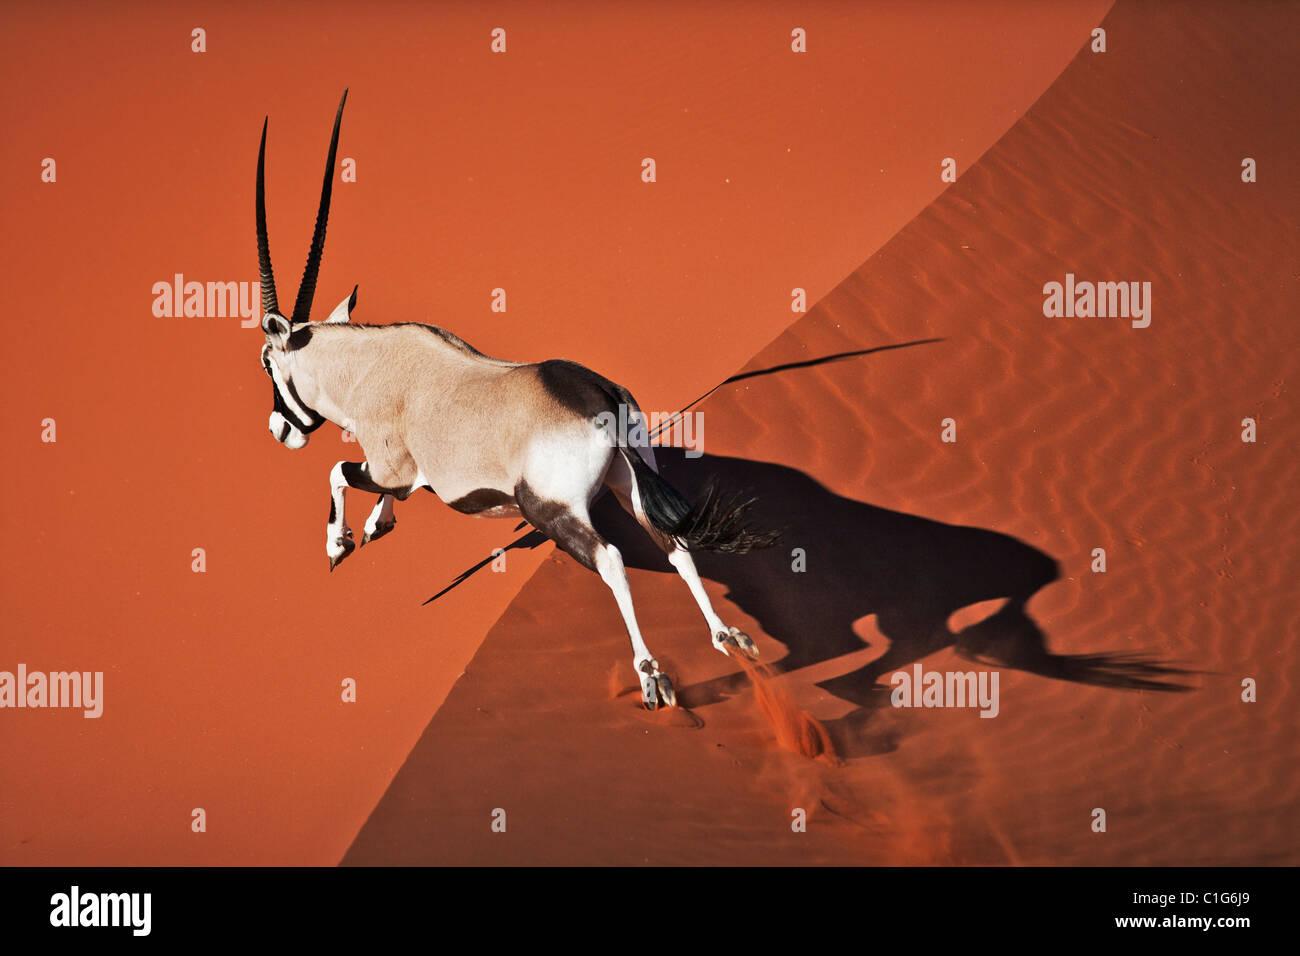 Gemsbok (Oryx gazella) In typical desert habitat Namibian desert sand dunes - Stock Image